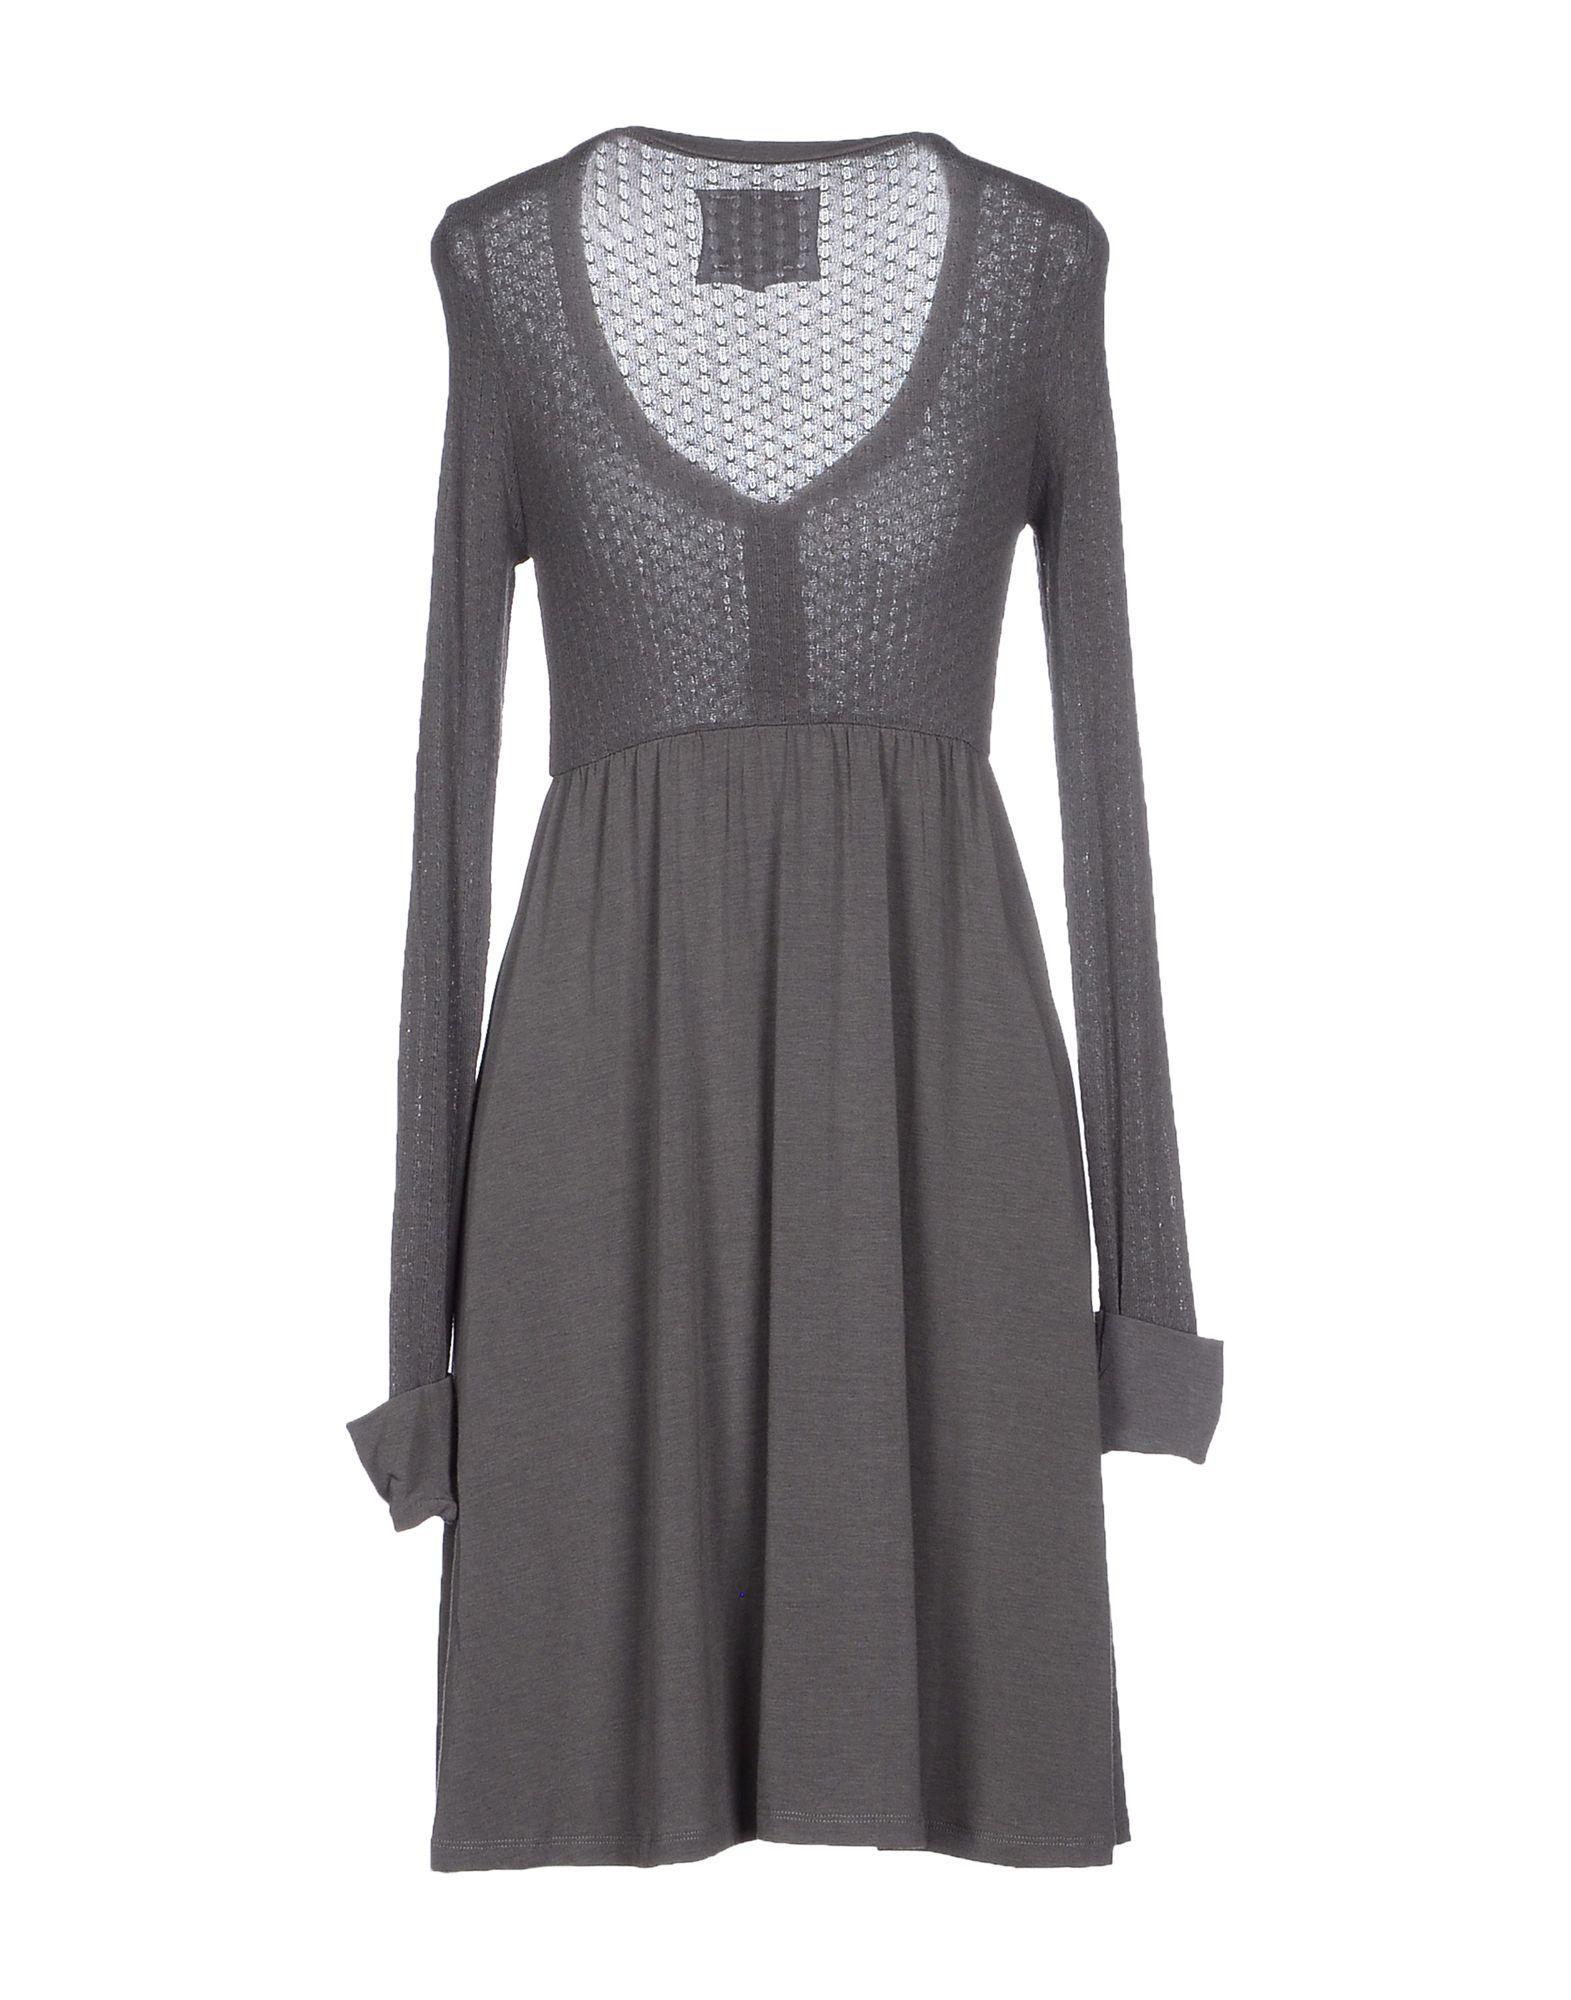 0382810a696 Lyst - Made In Heaven Short Dress in Gray